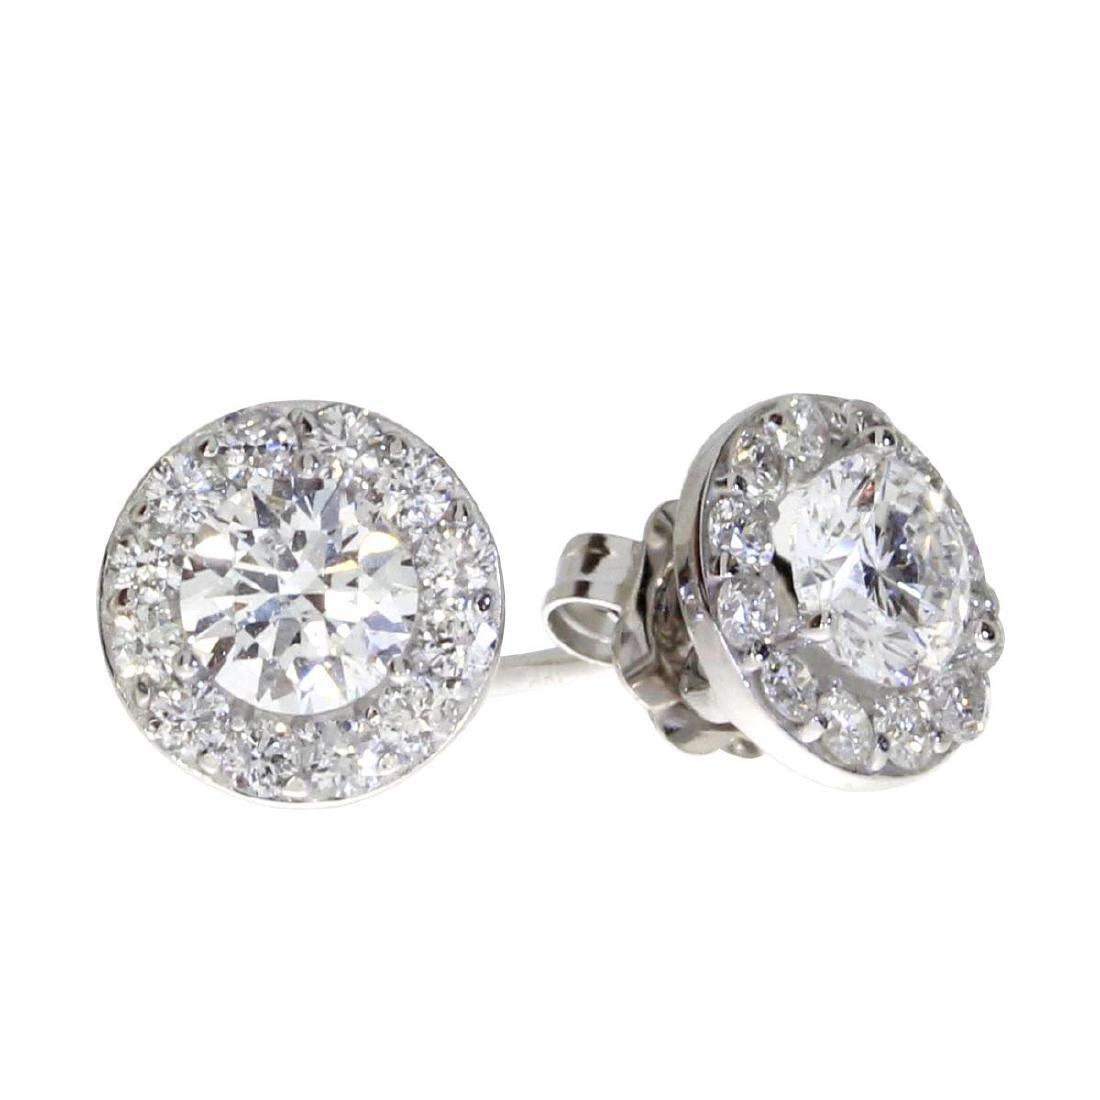 Certified 14K White Gold .79 ct Diamond Halo Stud Earri